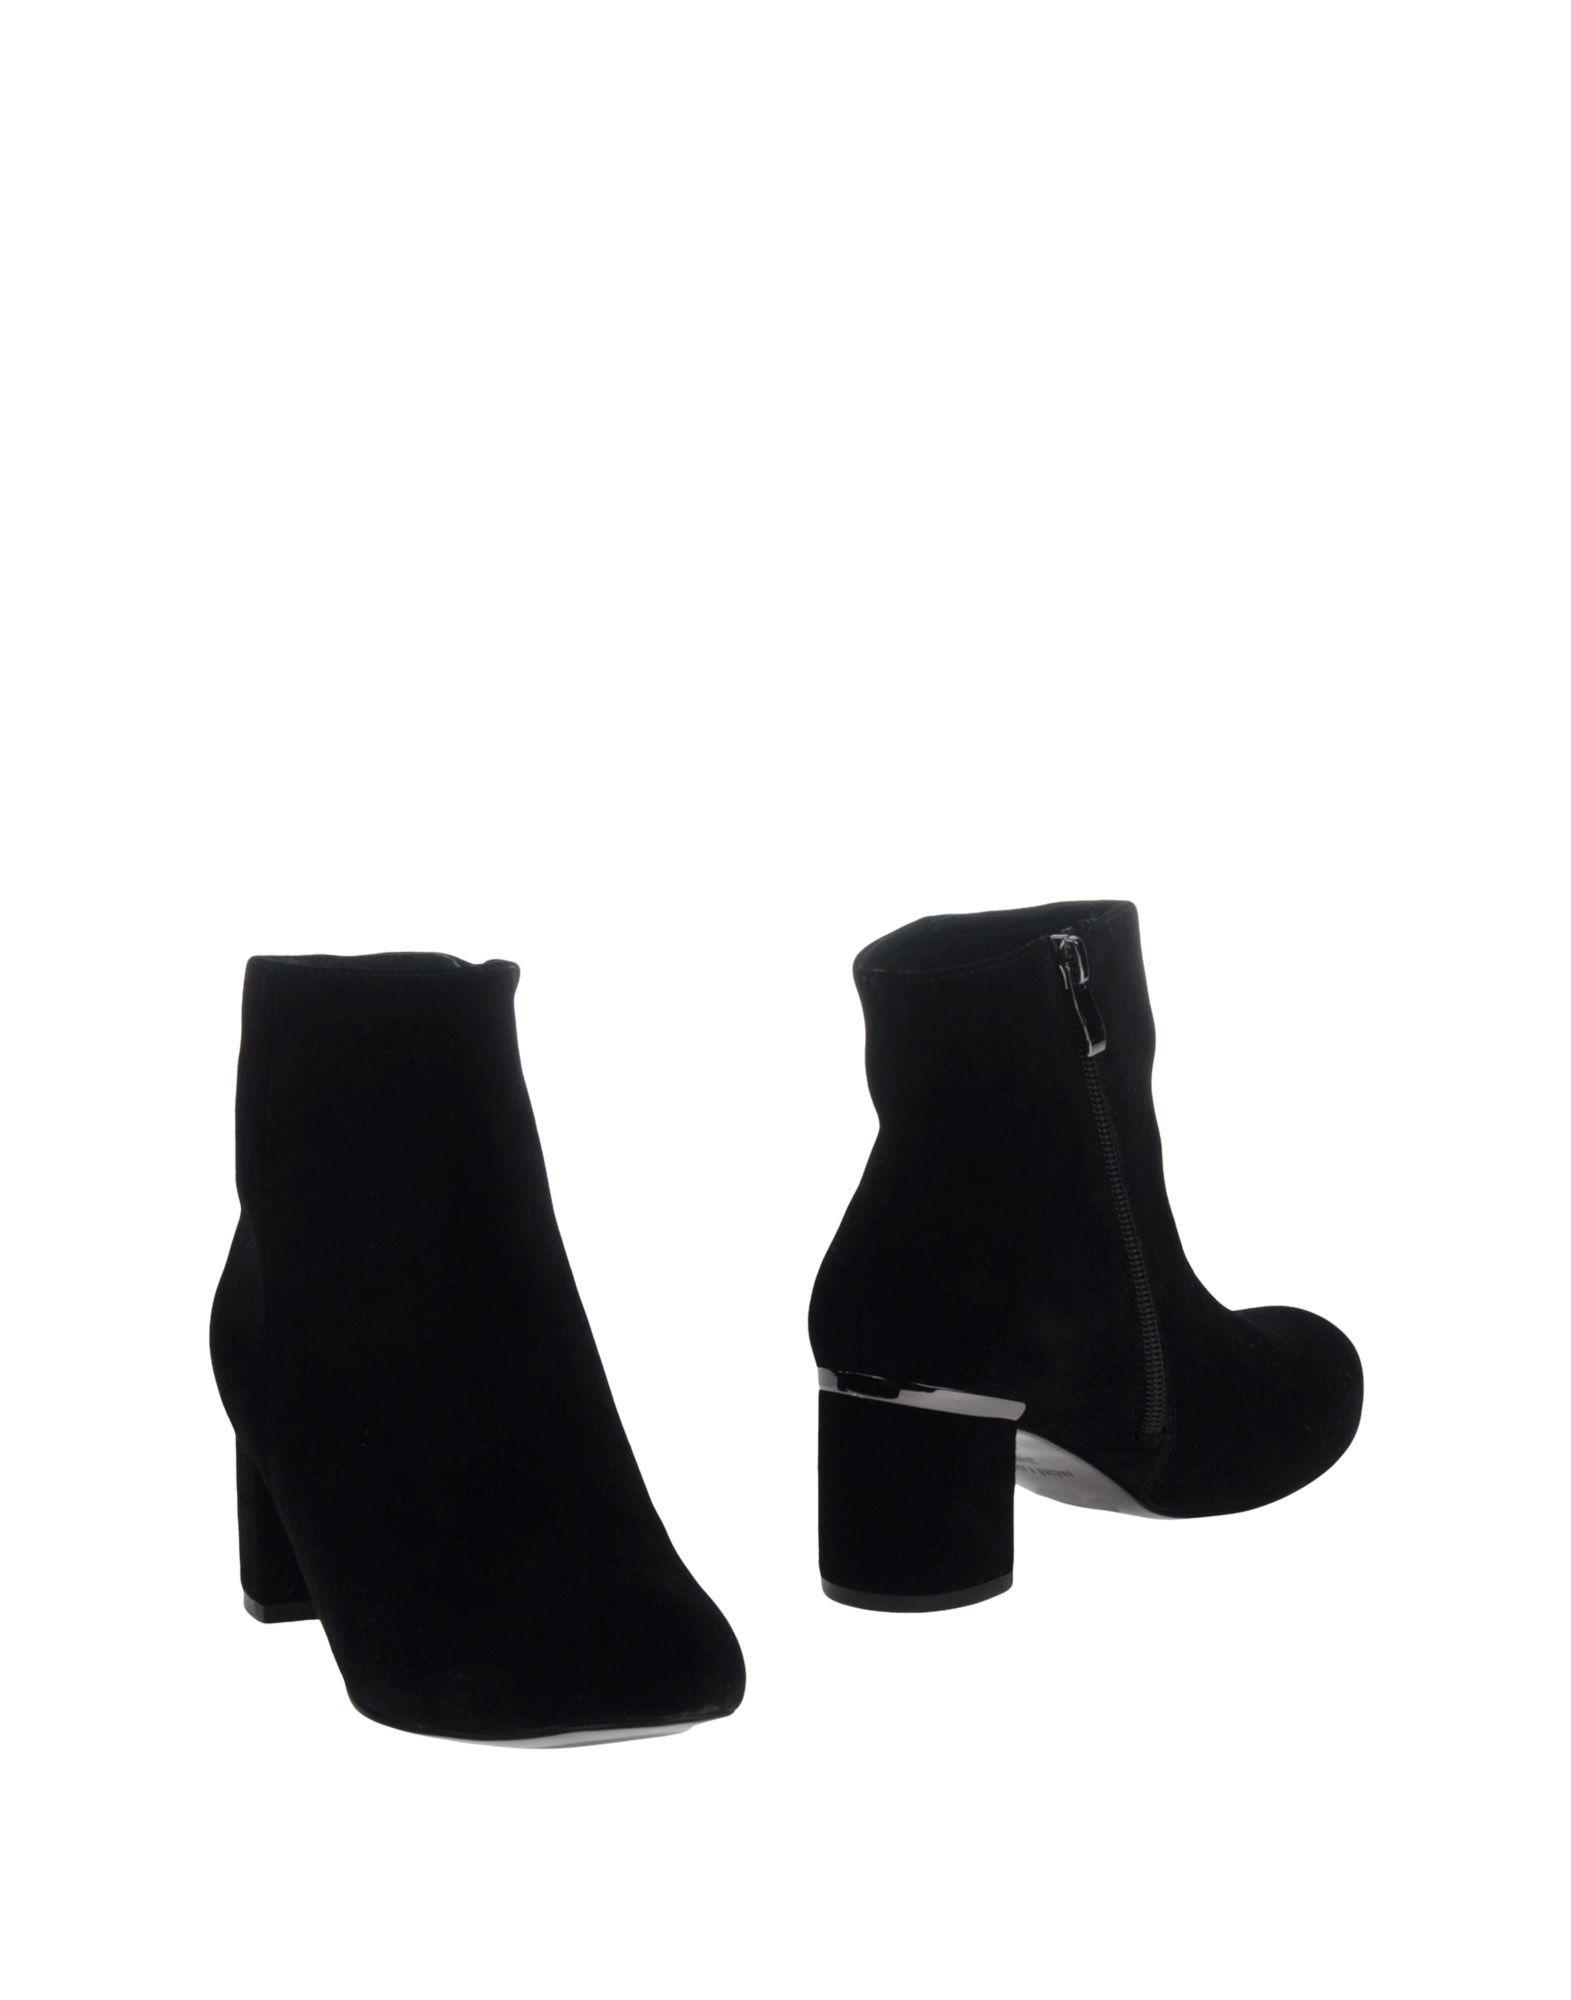 Bibi Lou Stiefelette Damen  11271440NK Gute Qualität beliebte Schuhe